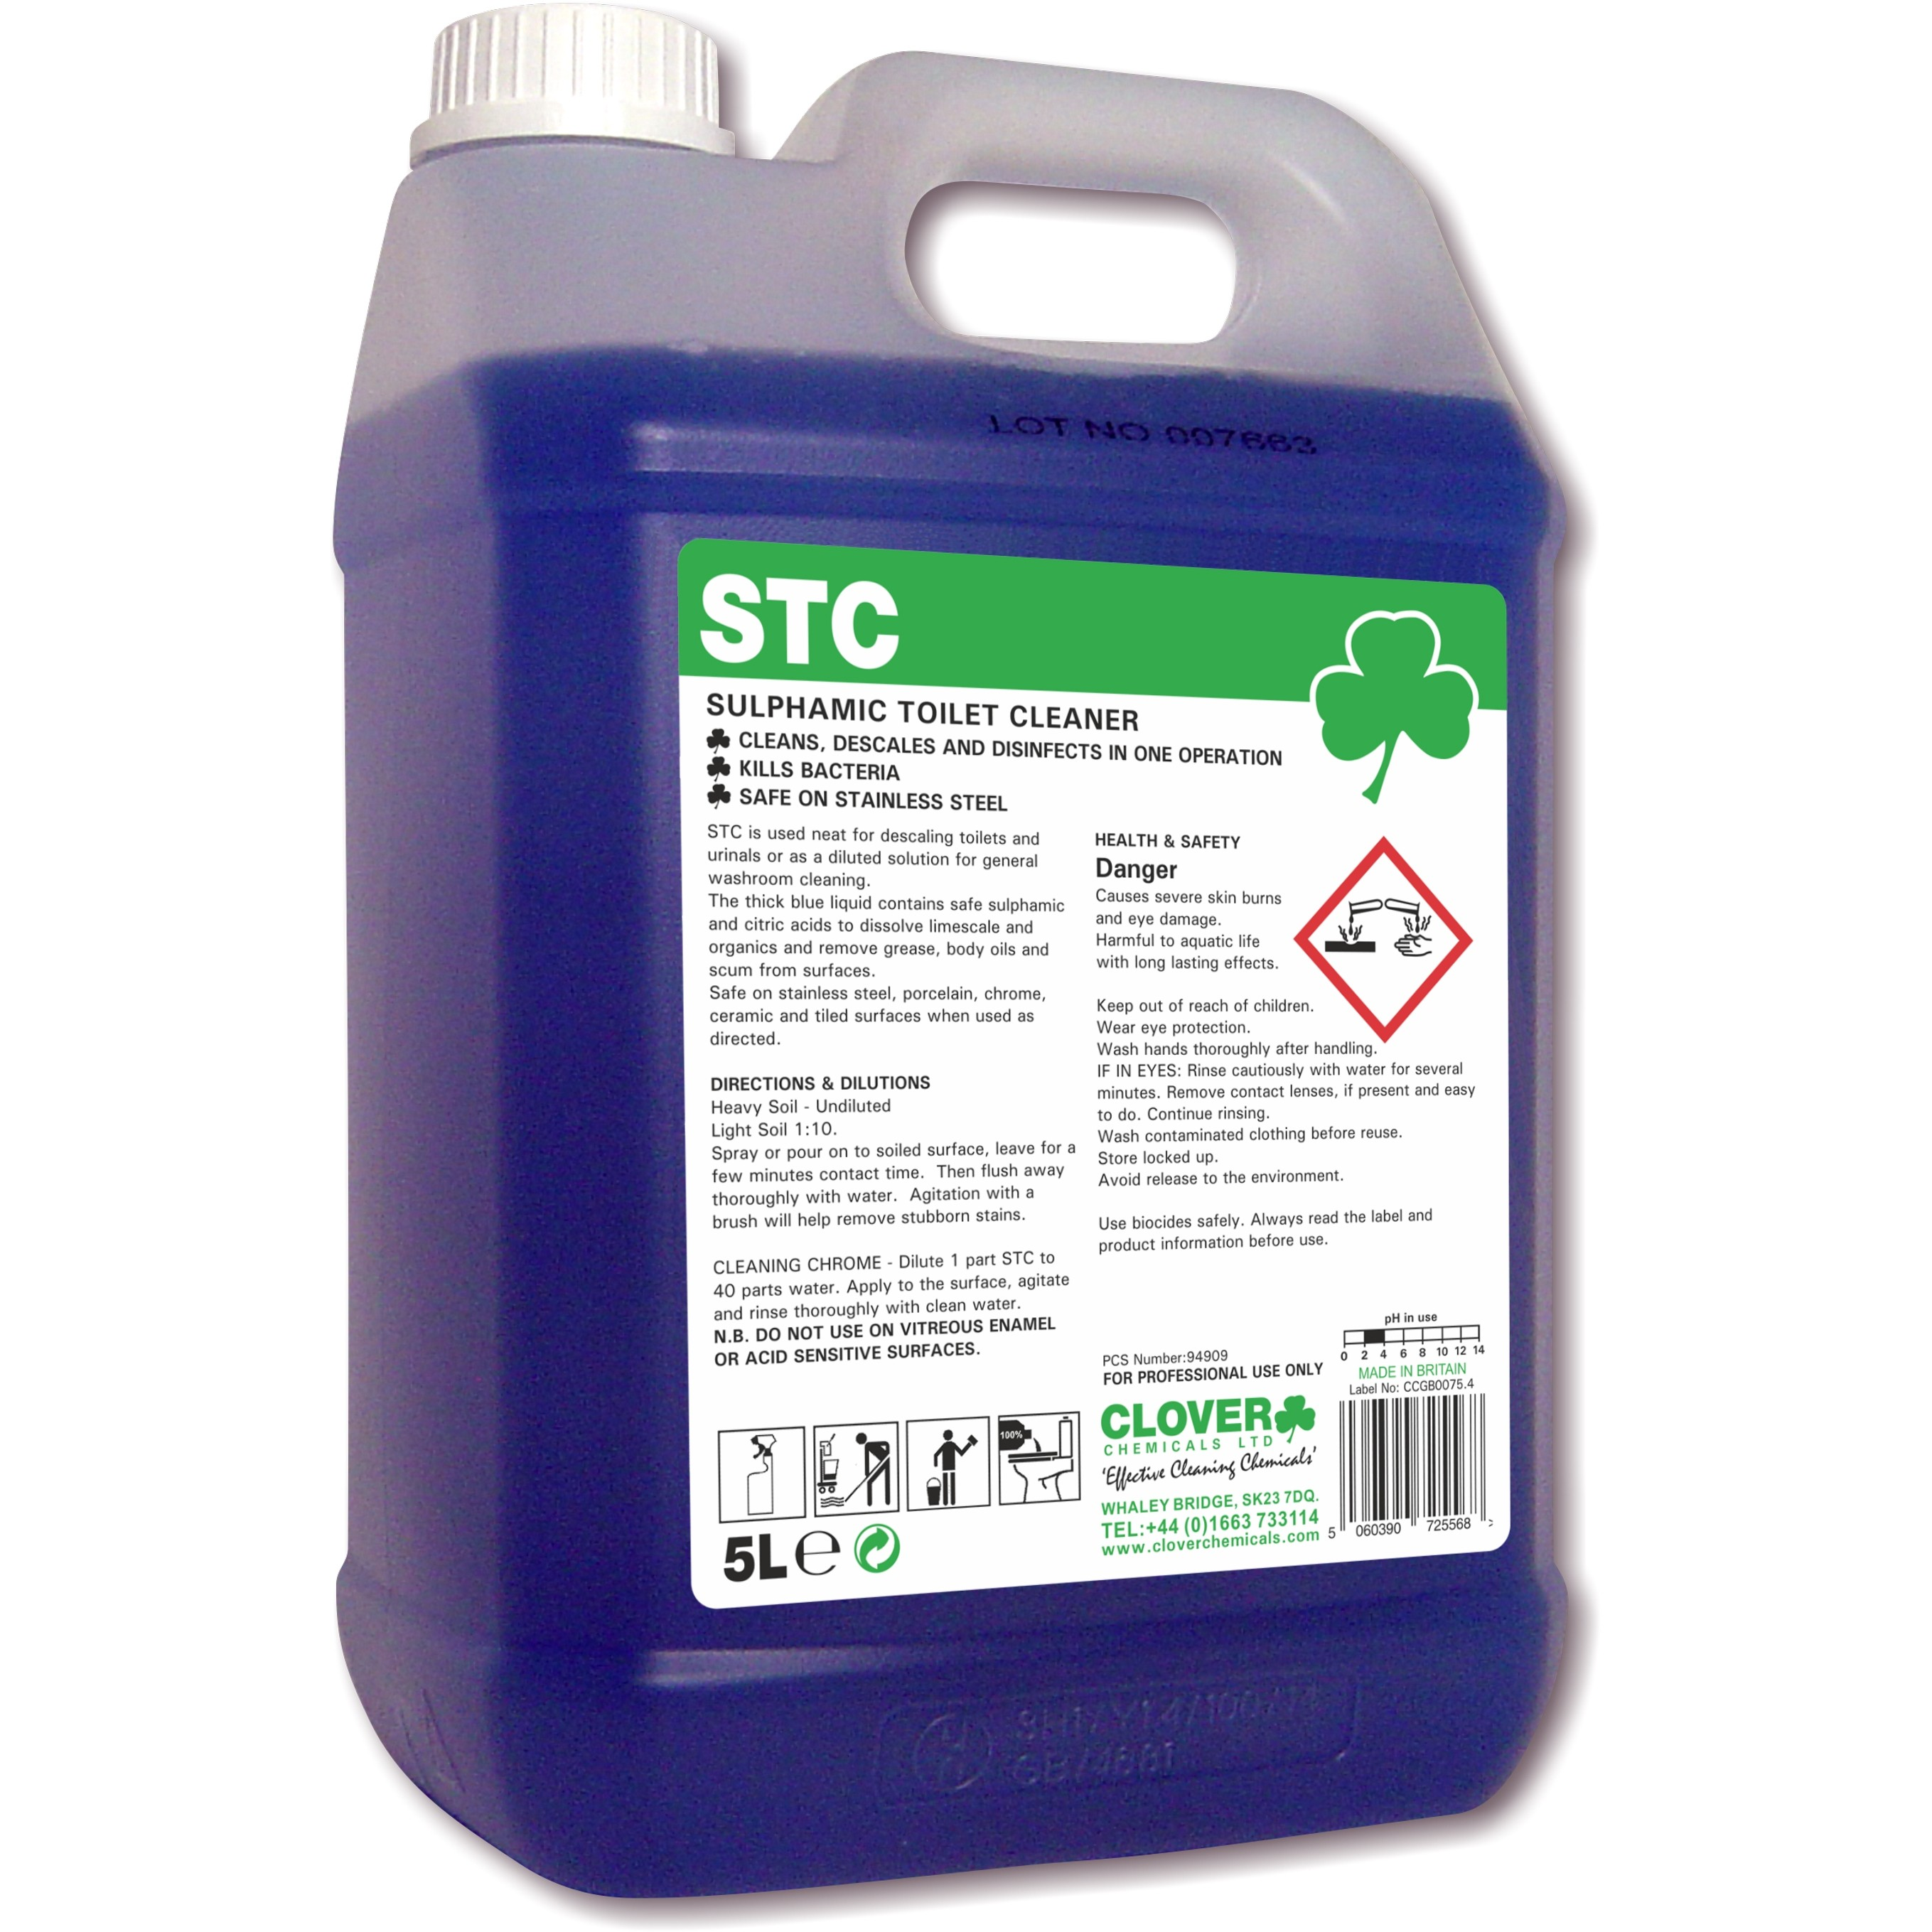 Washroom Products: Clover STC Washroom Cleaner